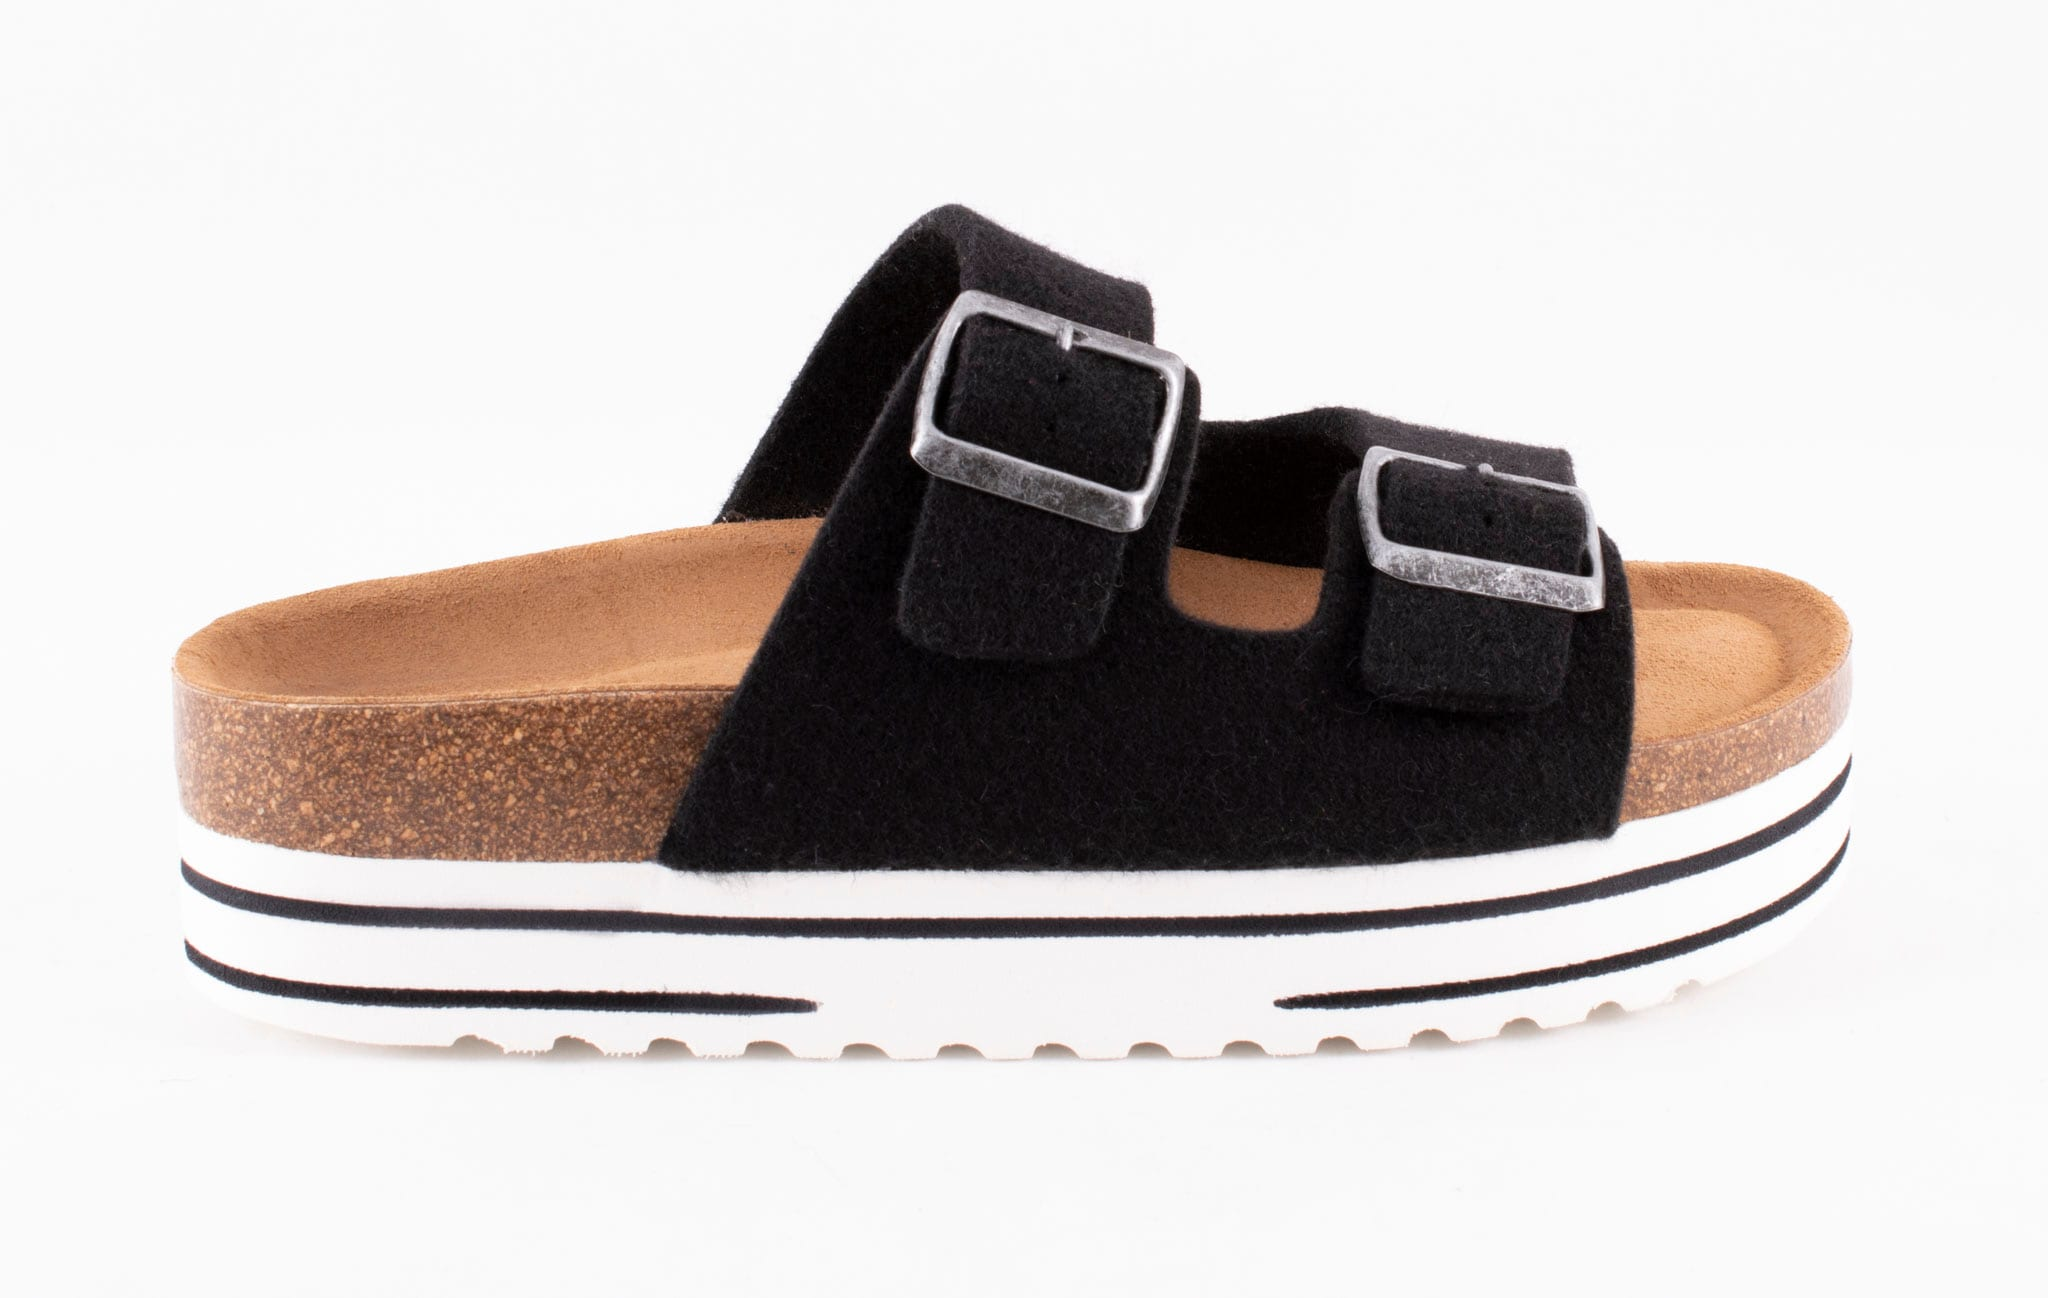 Kattis sandals